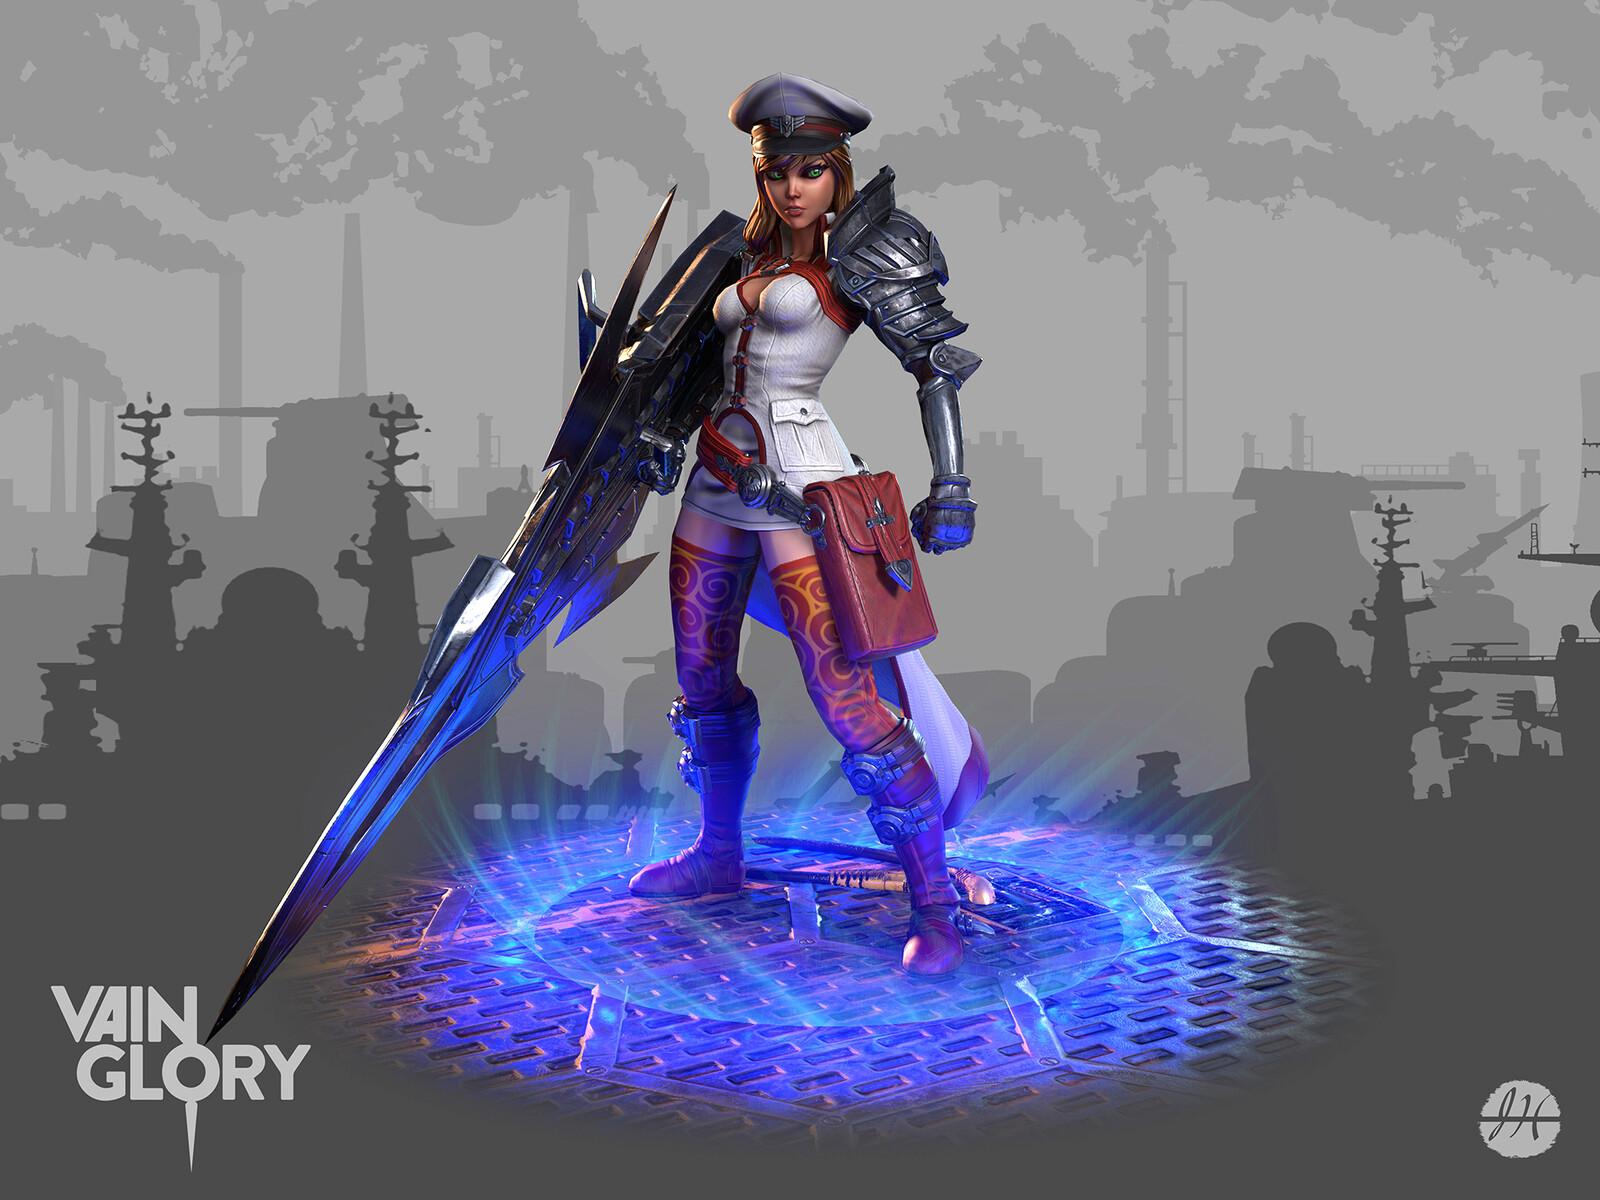 Catherine hero PC from Vainglory